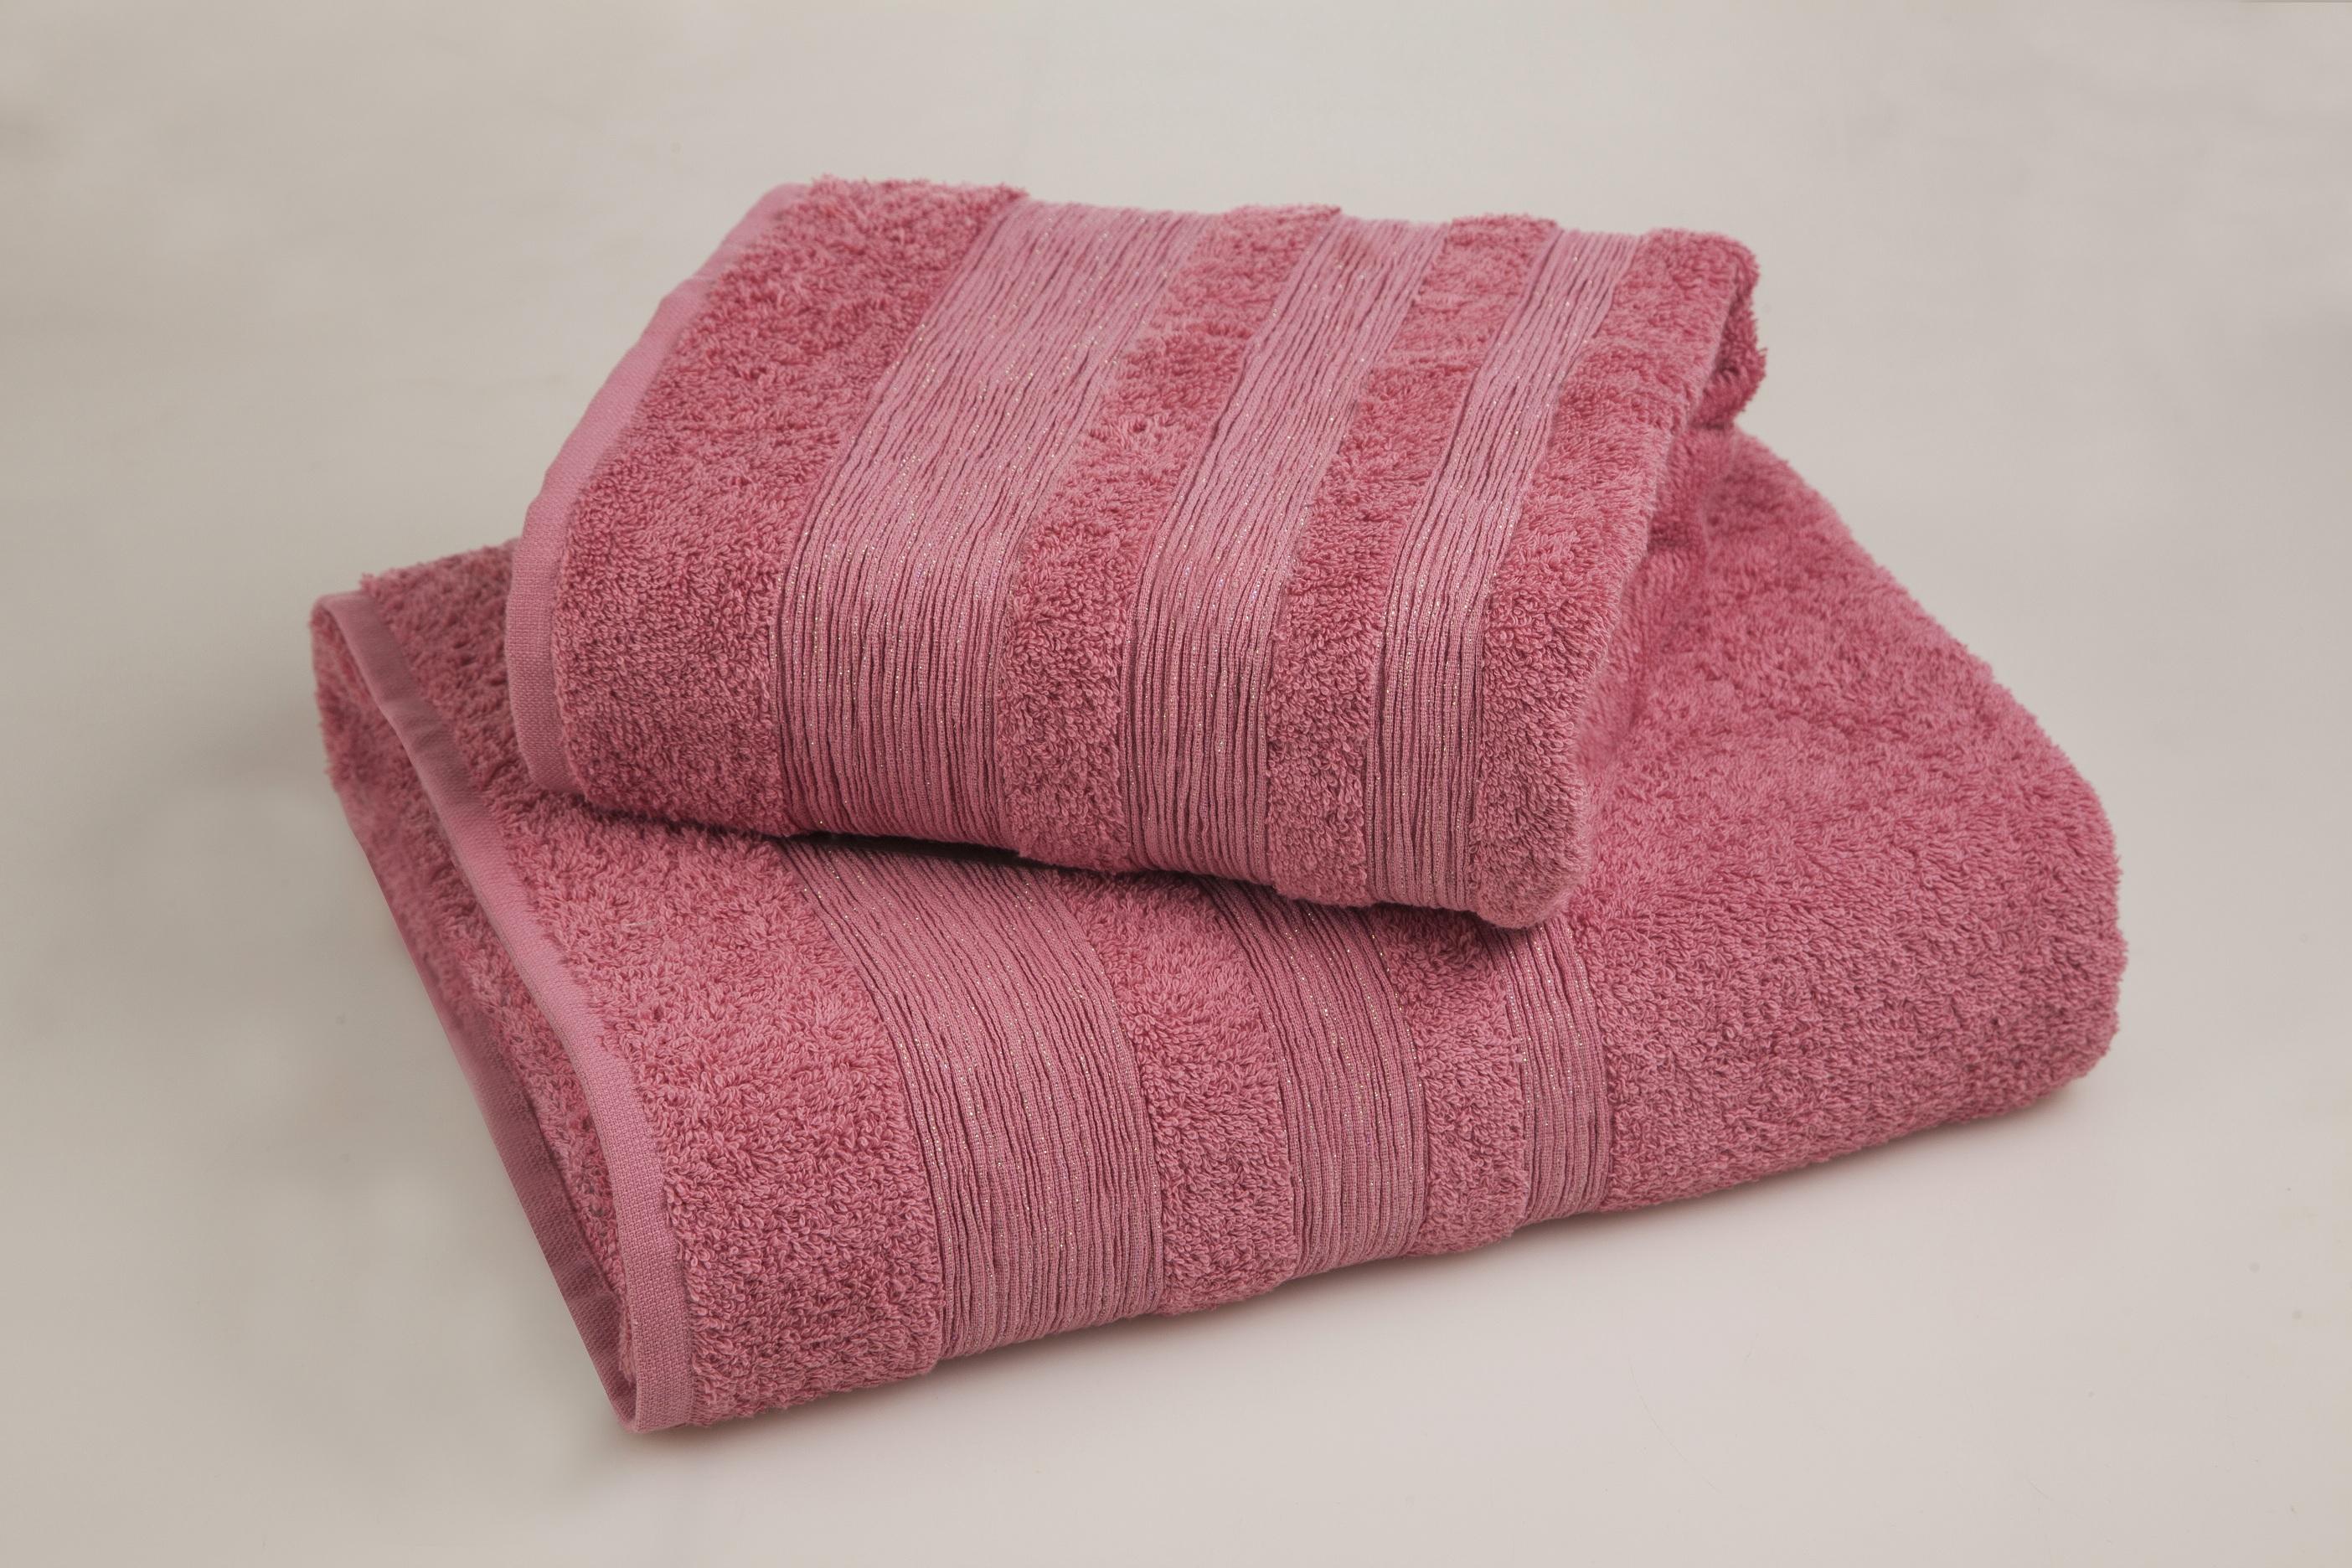 Полотенца Унисон Полотенце Caprice Цвет: Розовый (Набор) полотенце набор хлопок 1017235